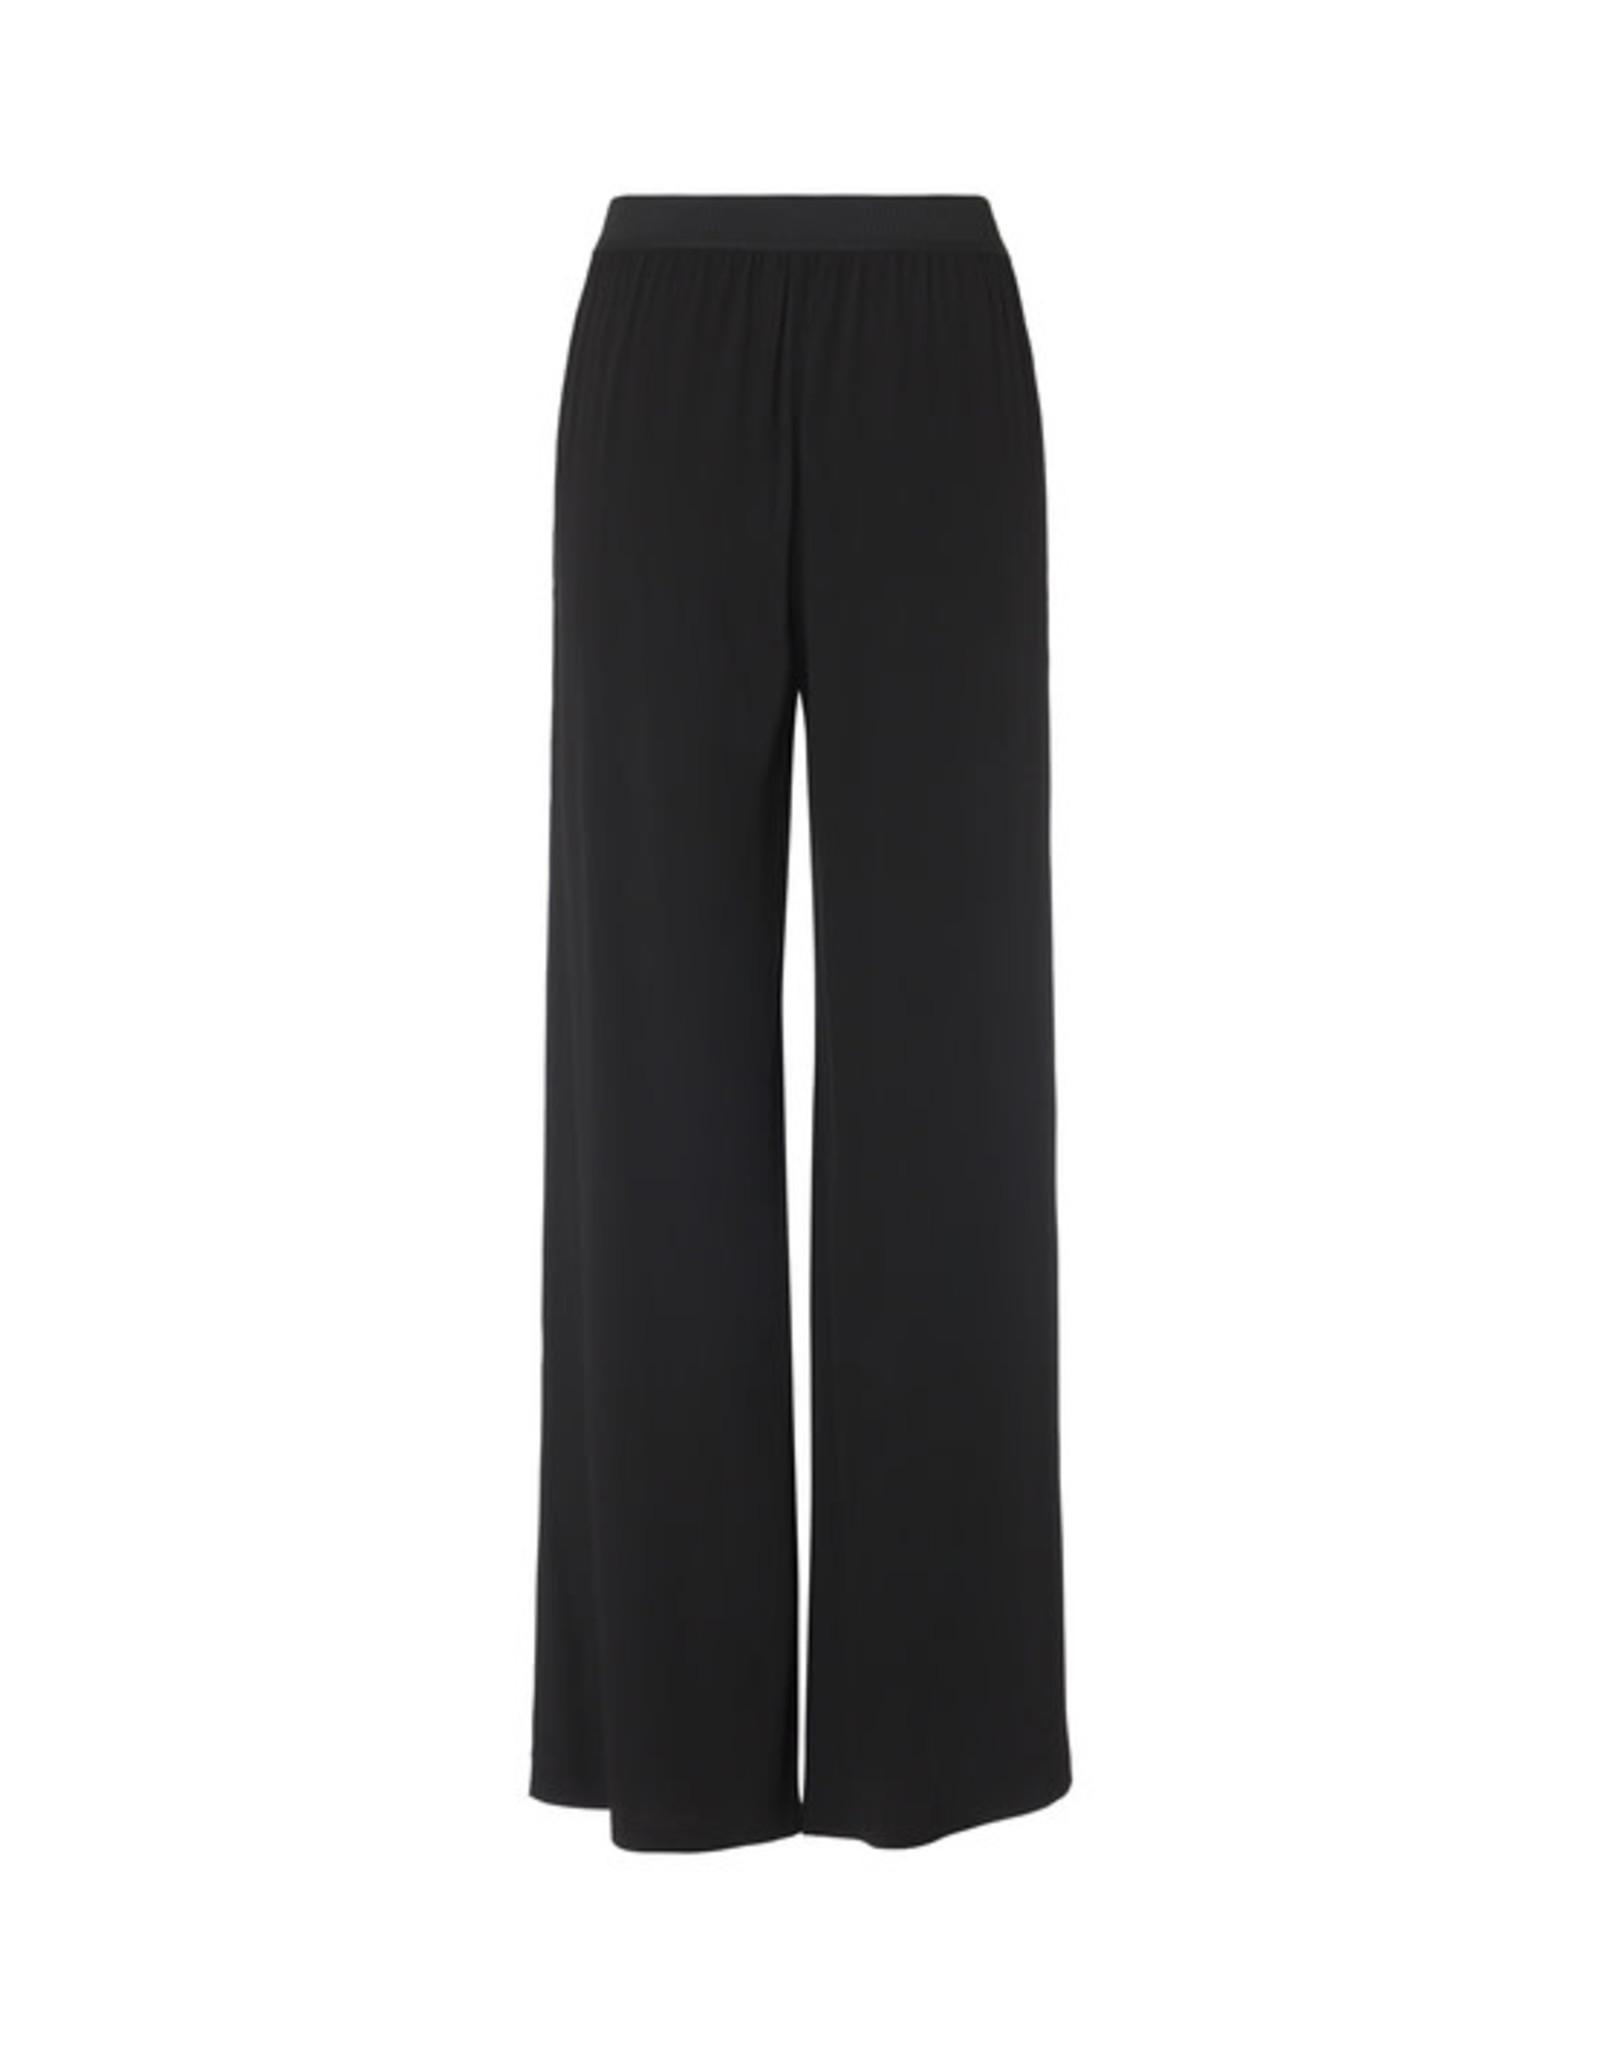 Samsoe Samsoe Nessie pants 6515 BLACK